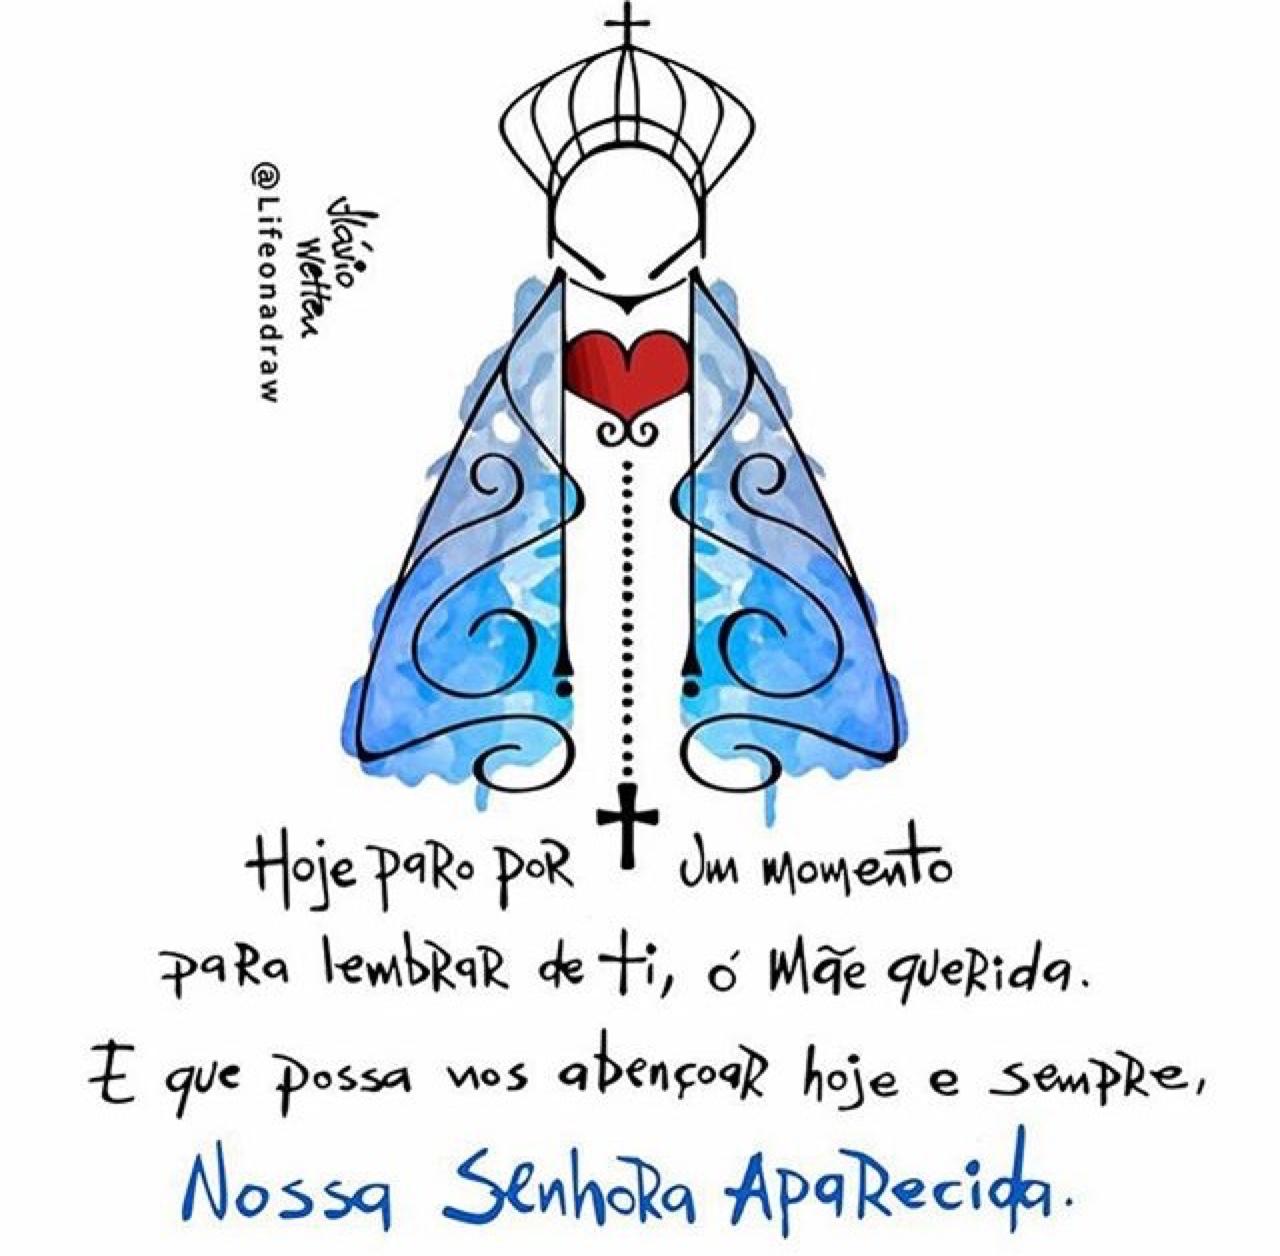 1000+ images about NOSSA SENHORA DE APARECIDA on Pinterest.